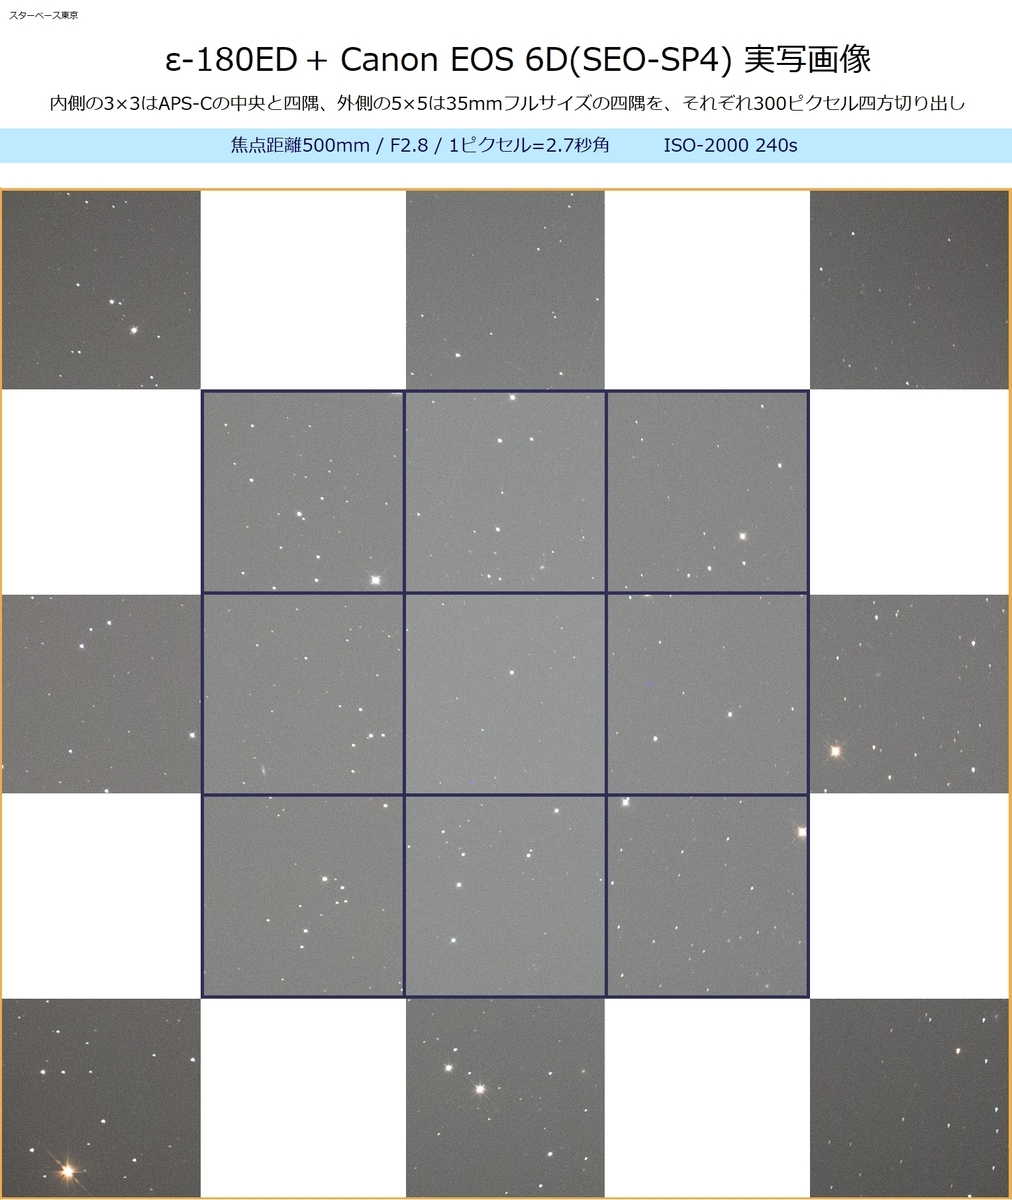 f:id:starbase:20190521225408j:plain